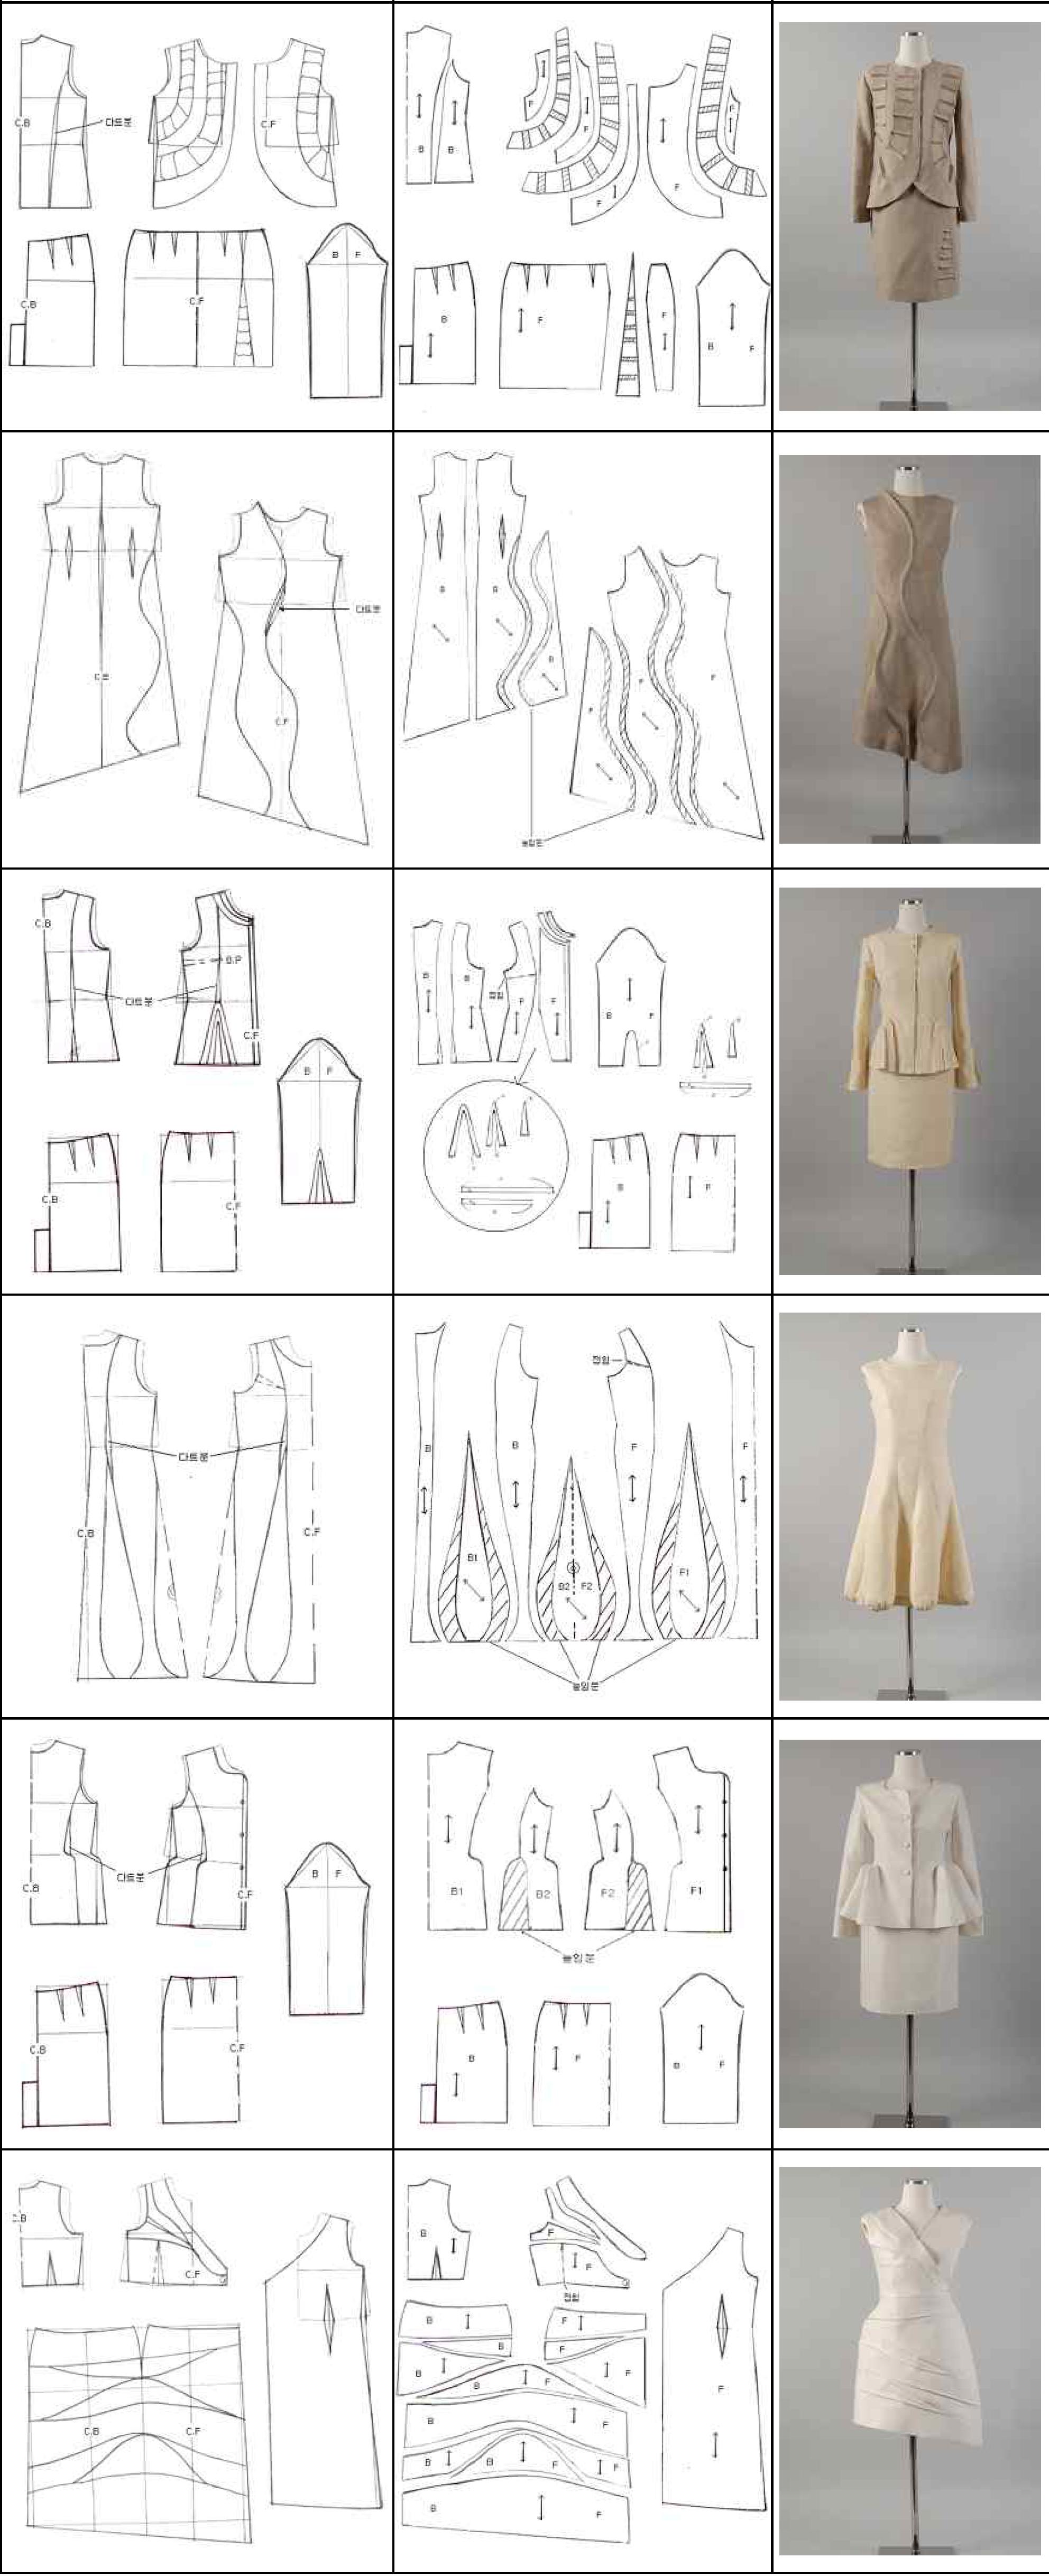 Pin de ✿ en Sewing + Craft Tutorials | Pinterest | Patrones ...